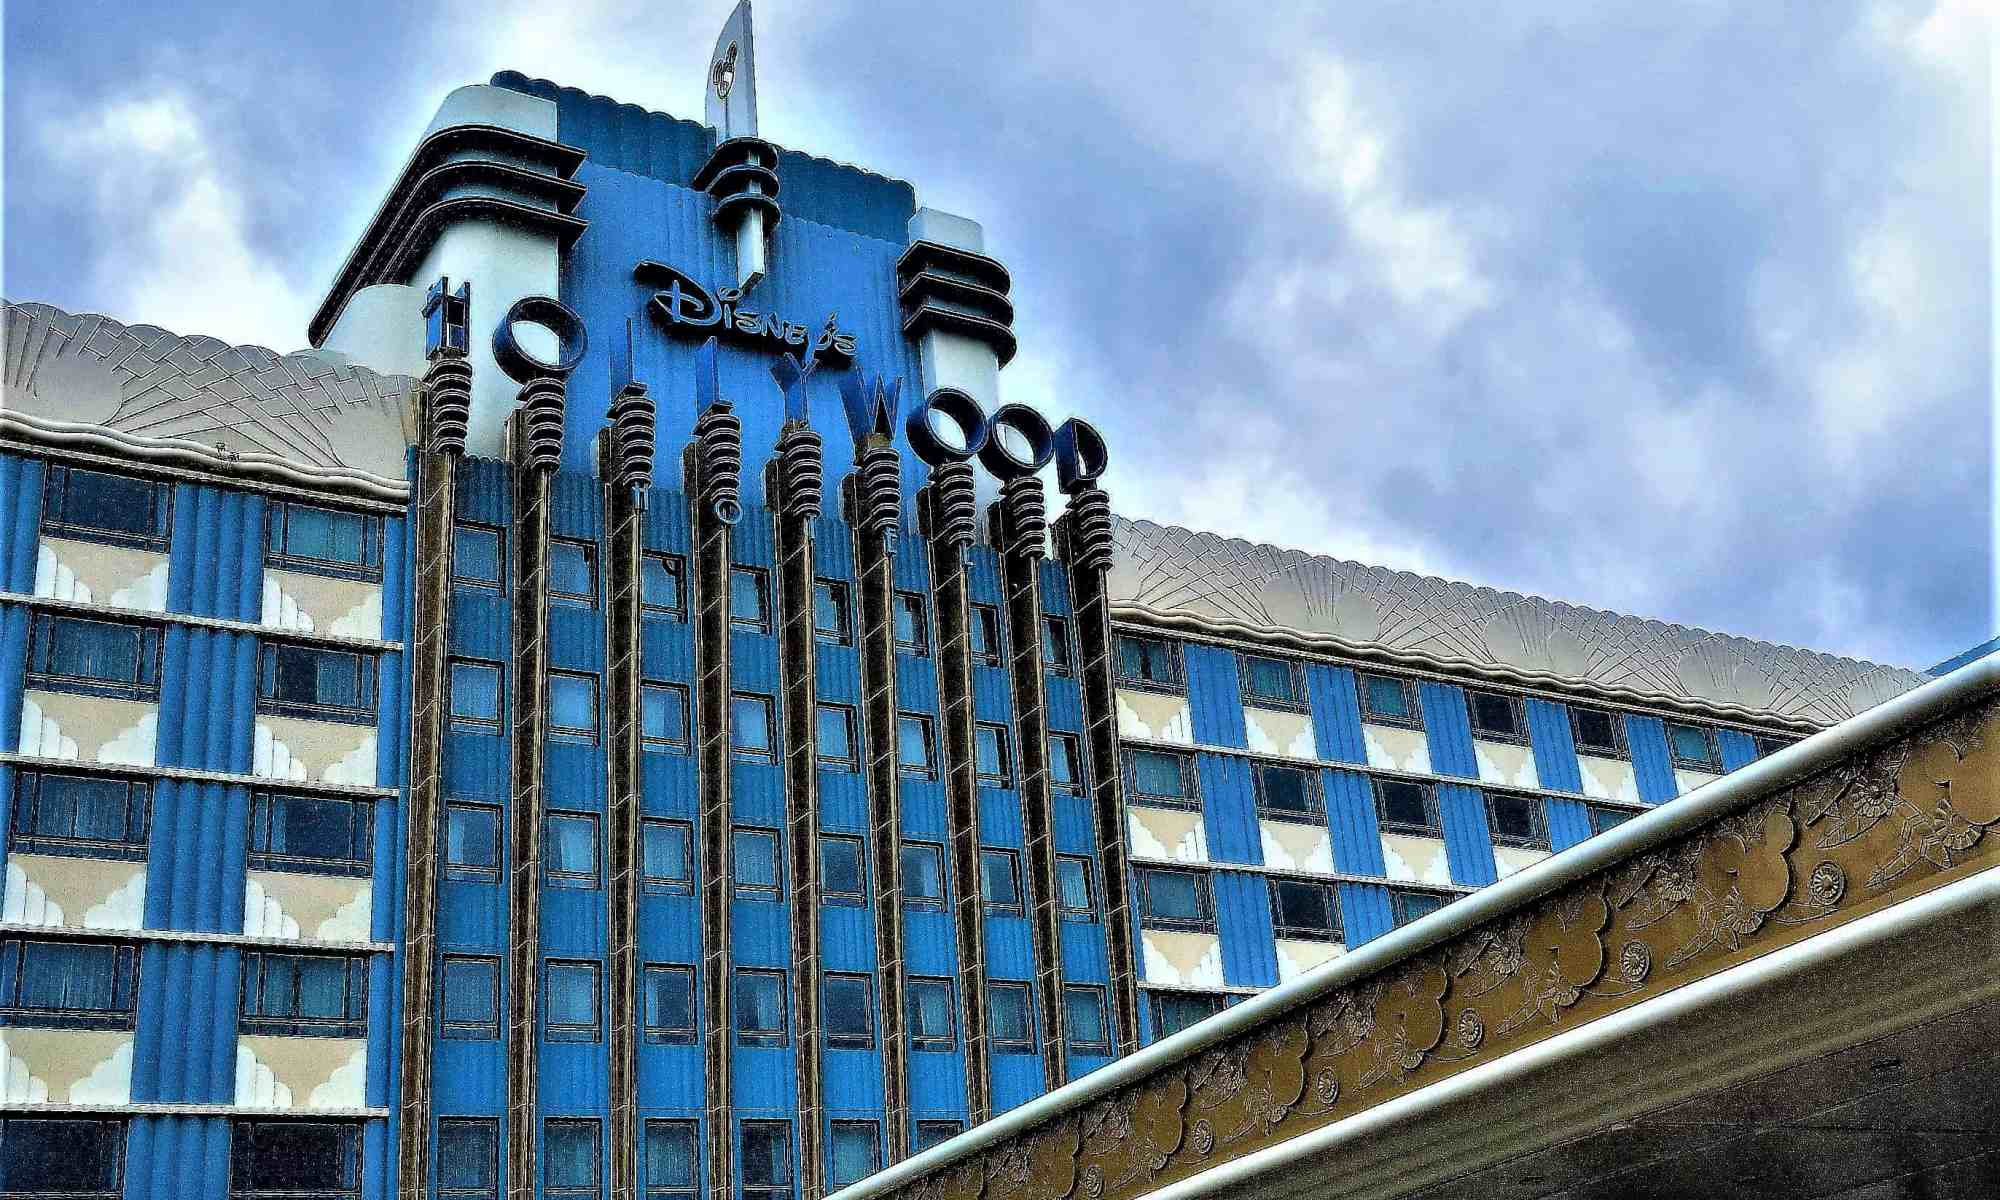 image-of-Disneys-Hollywood-Hotel-facade